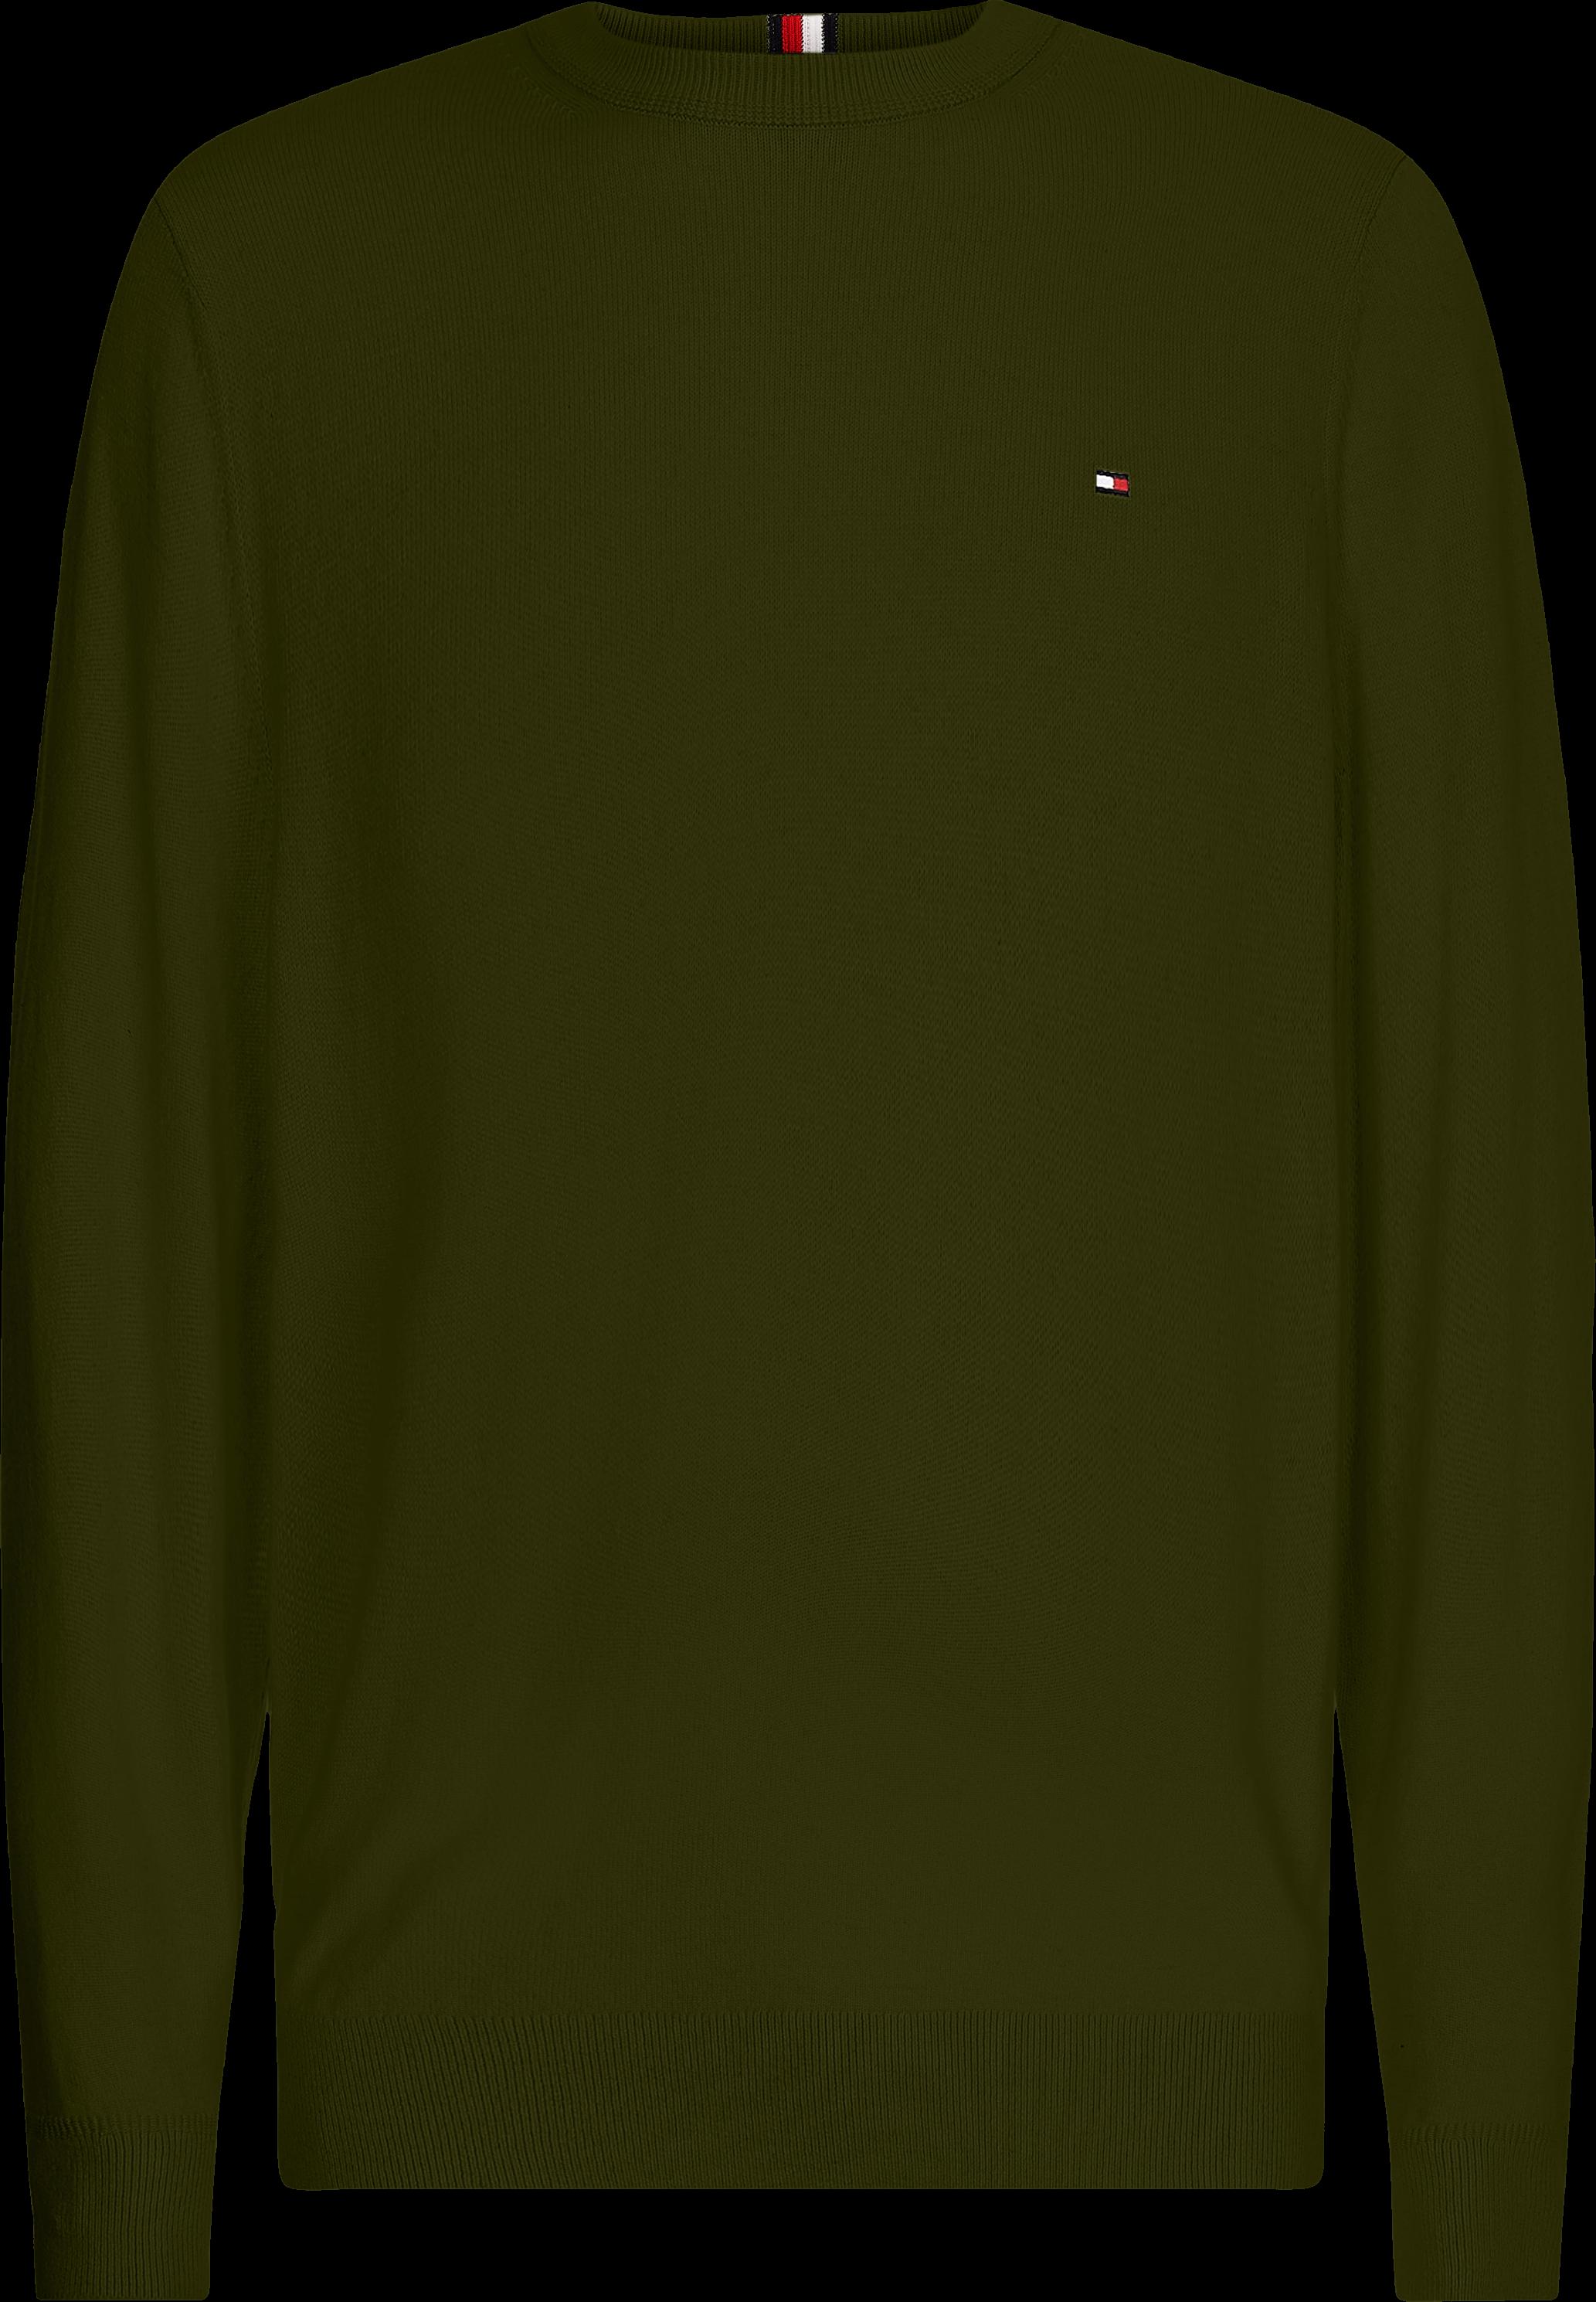 Tommy Hilfiger Sweatshirt, Olivewood, XXL